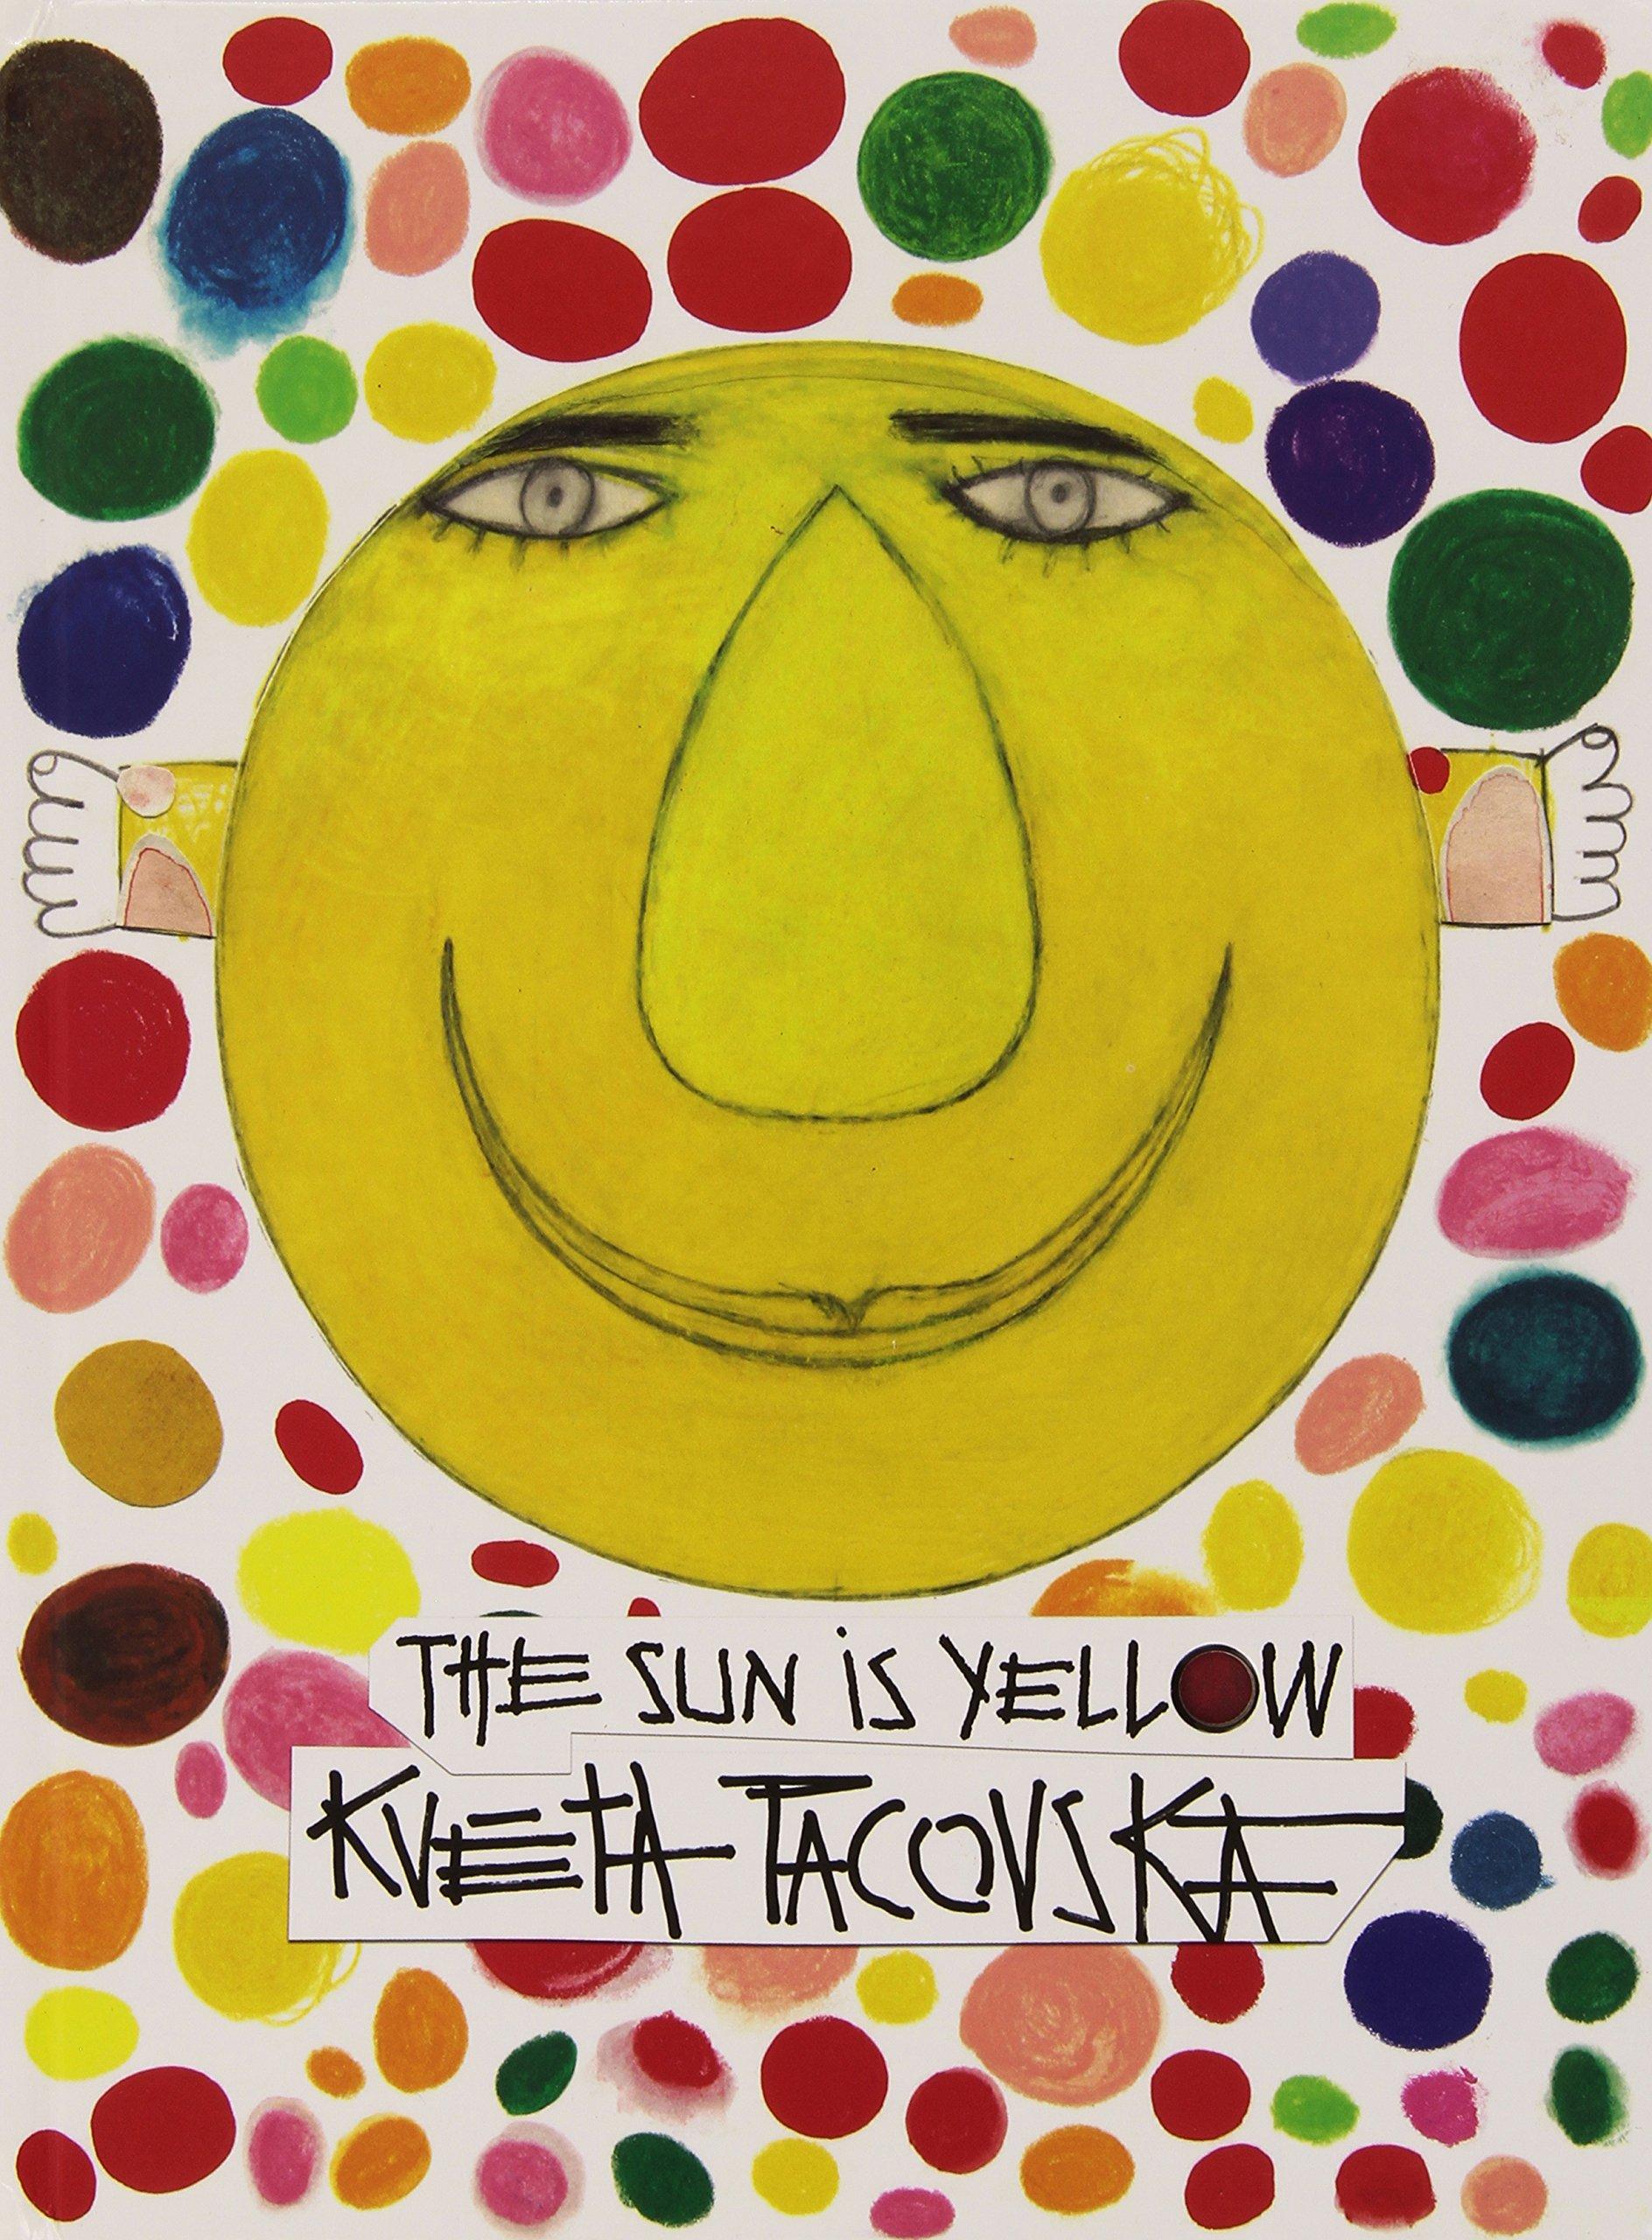 The Sun Is Yellow: Pacovská, Kveta: 9781849760645: Amazon.com: Books